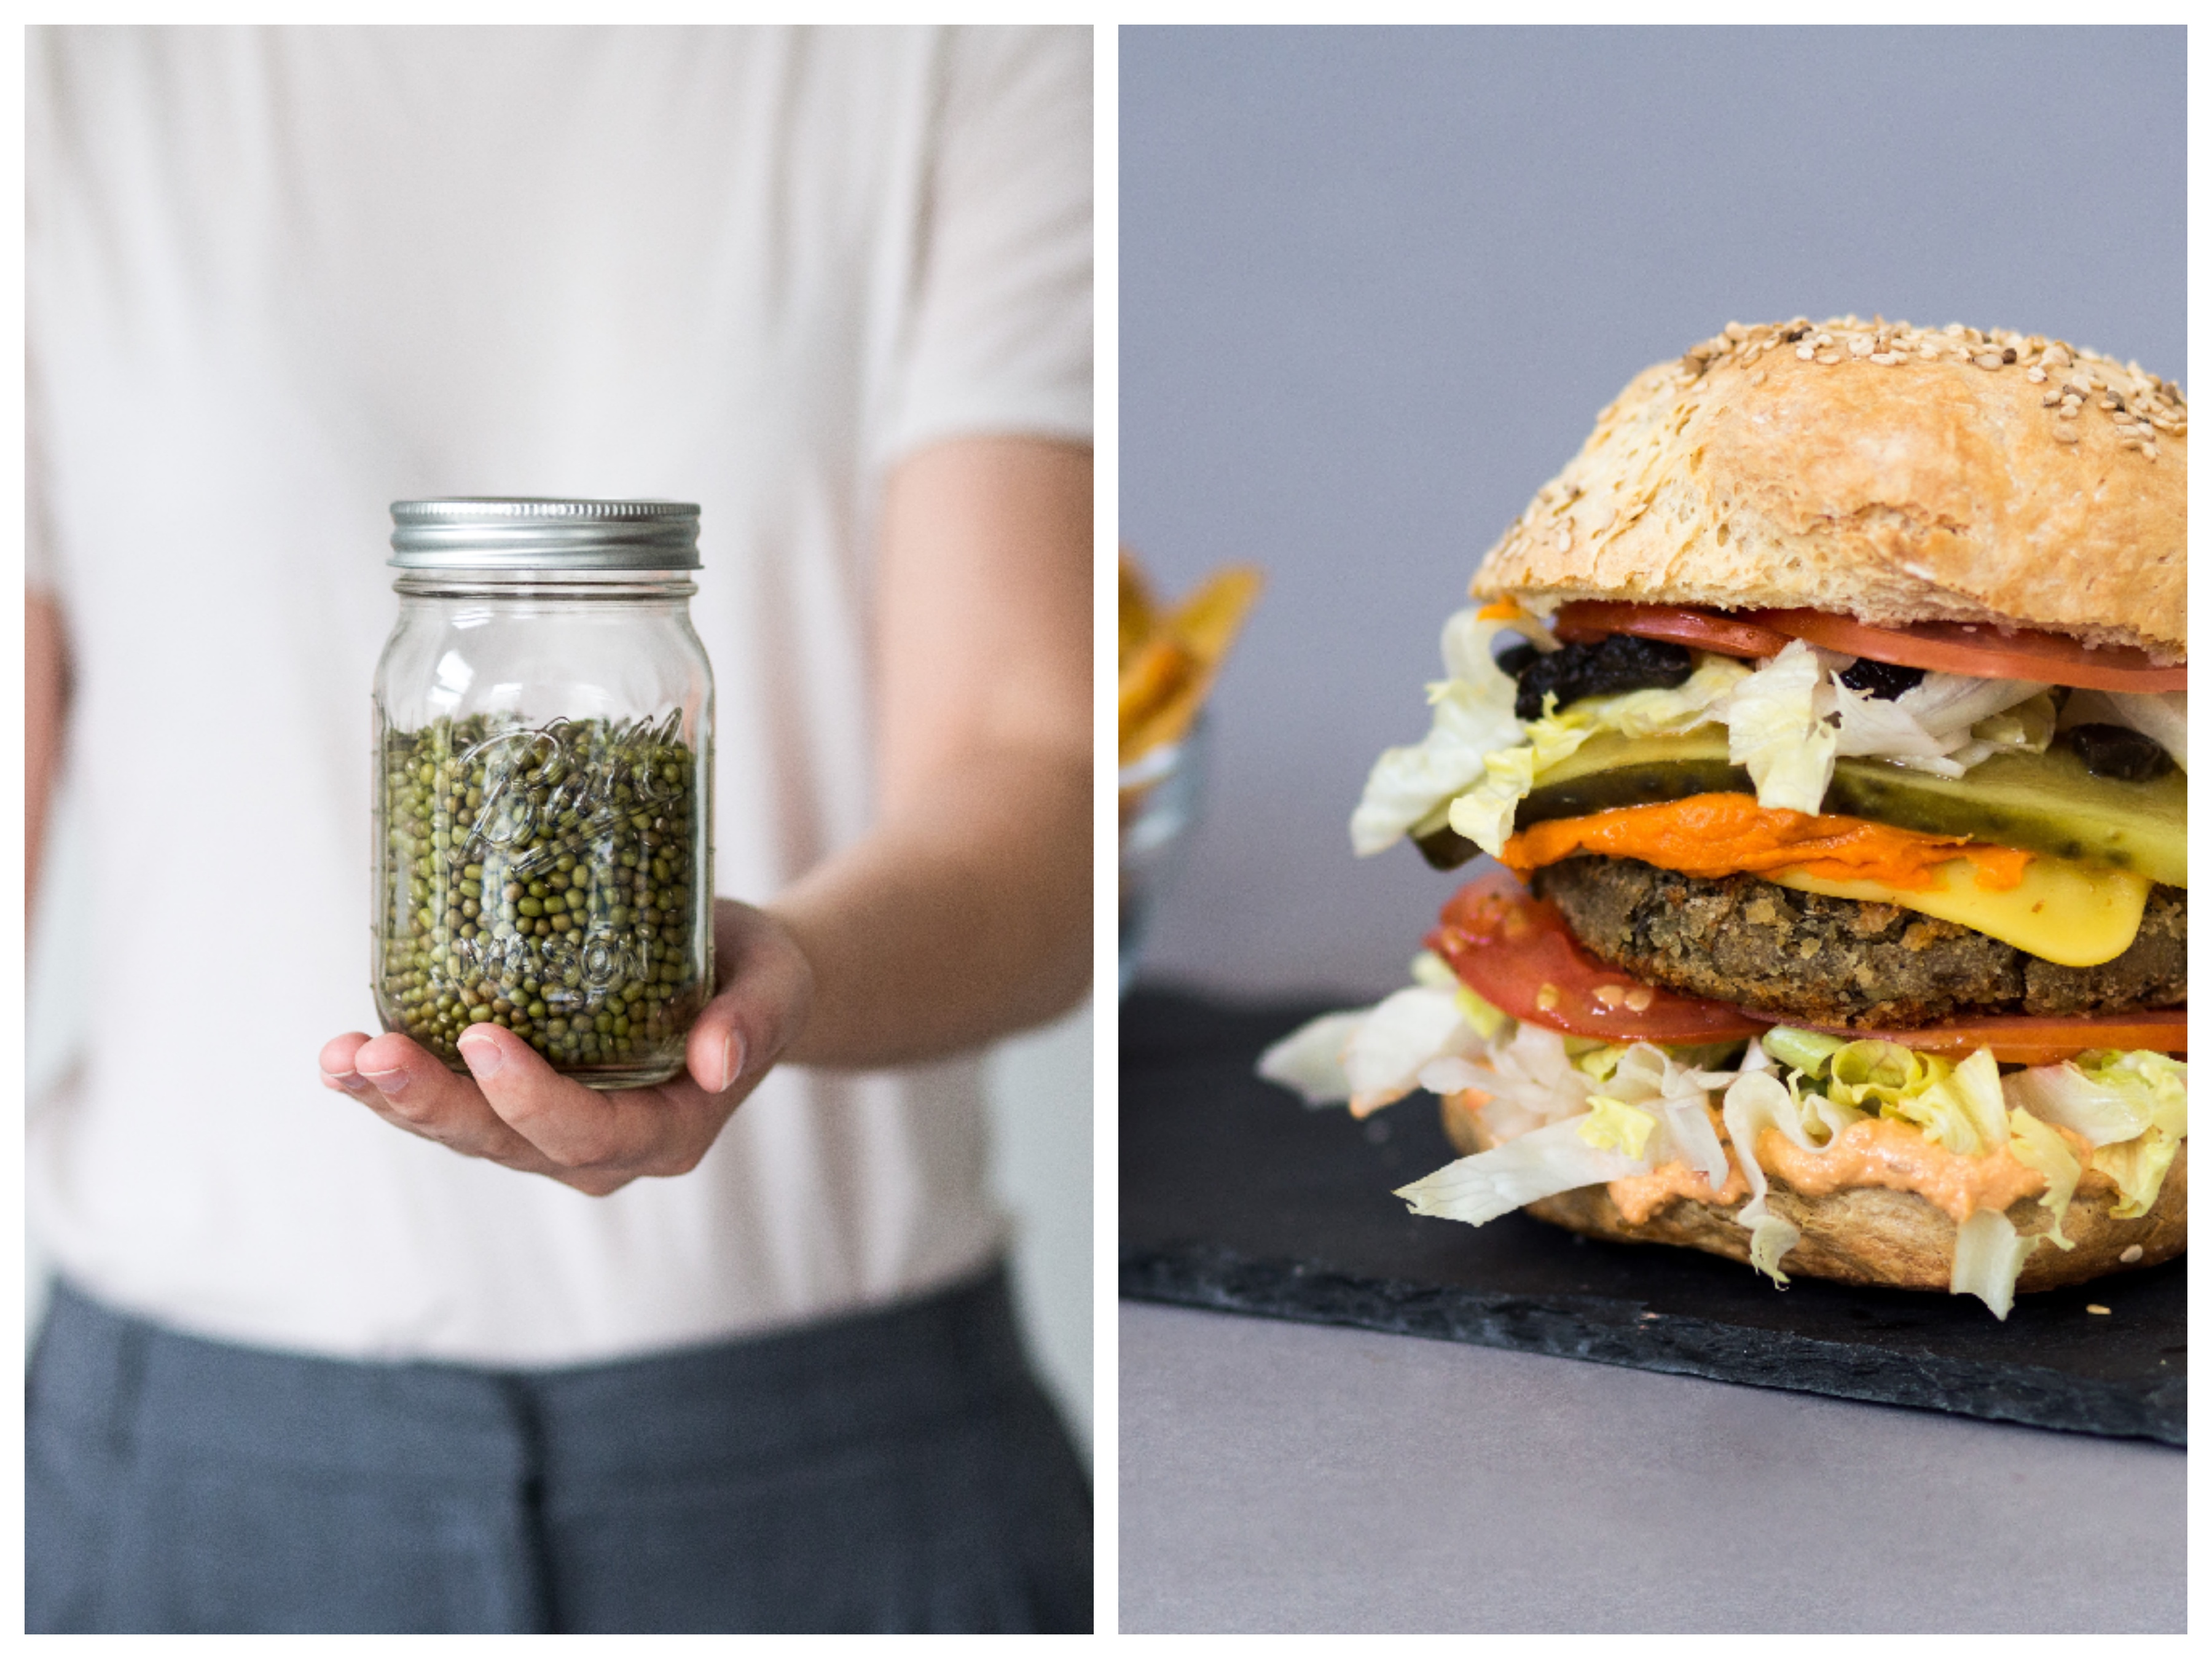 Mungobohnen Burger aus Lebensmittelvorräten